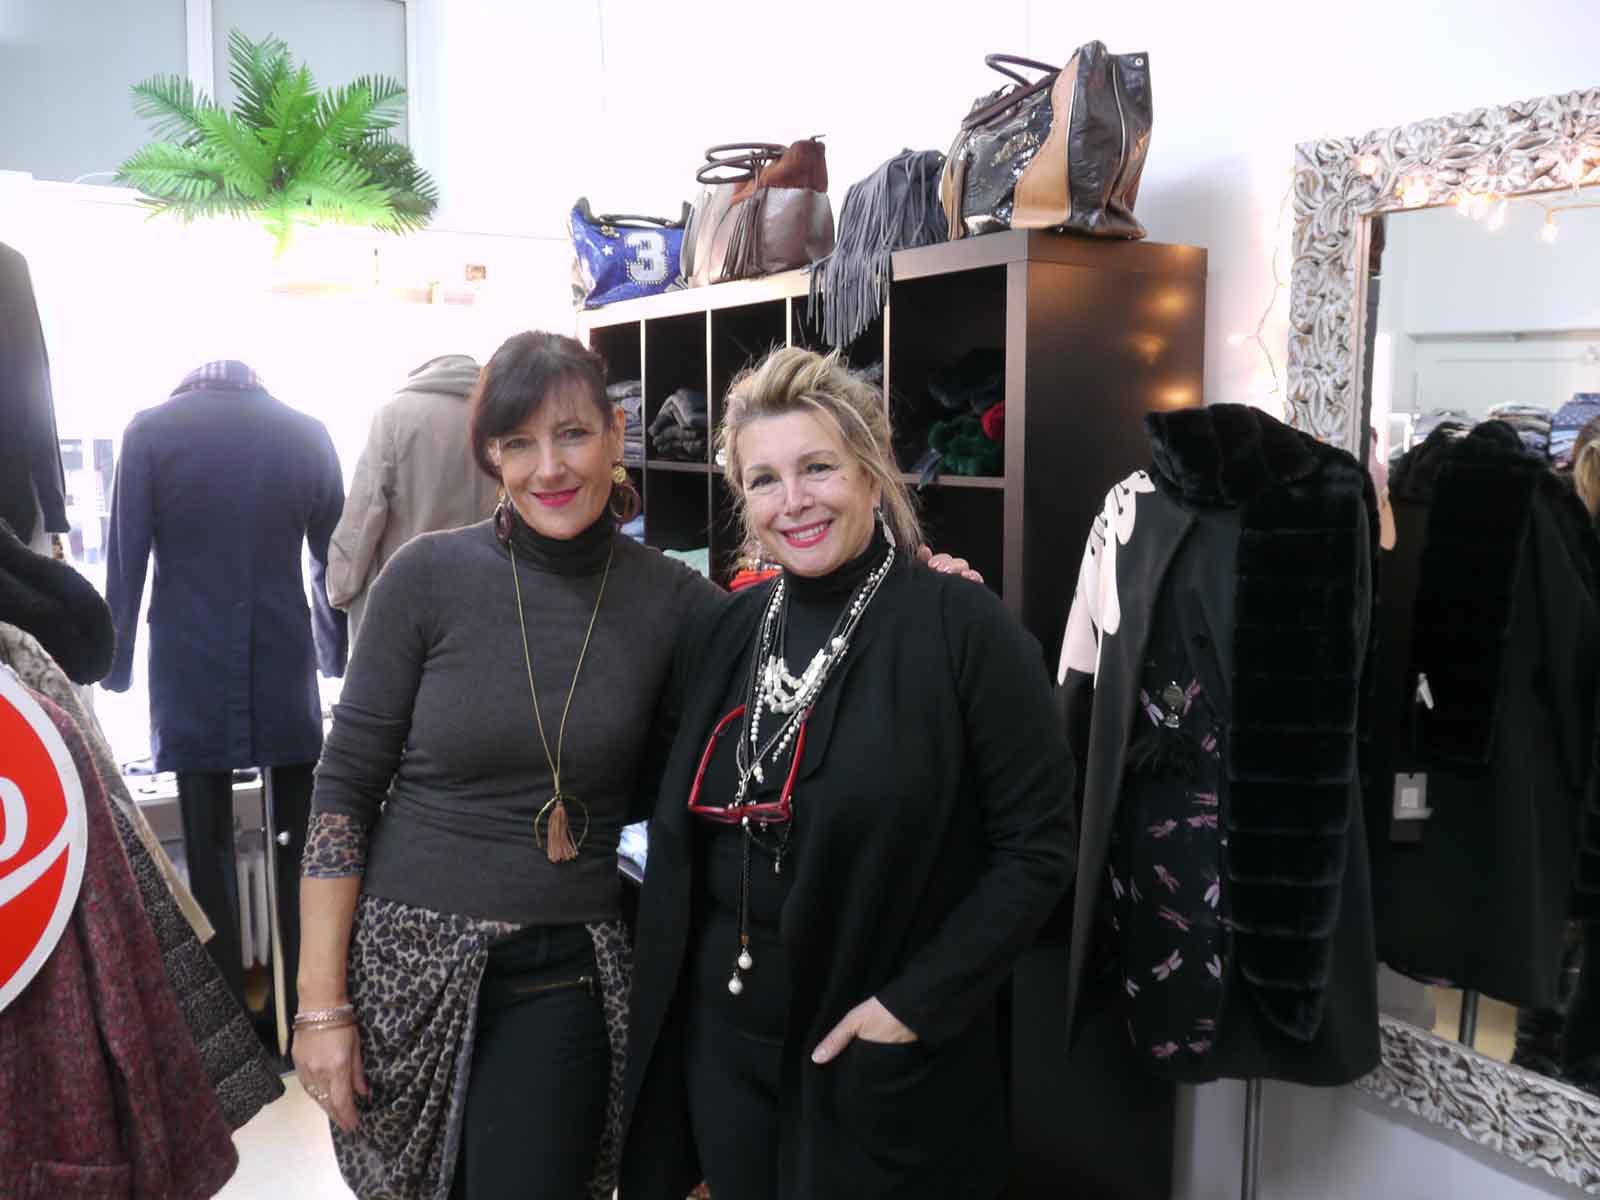 Francesca Cappello (r.), mit Assistentin Ursula Leiser